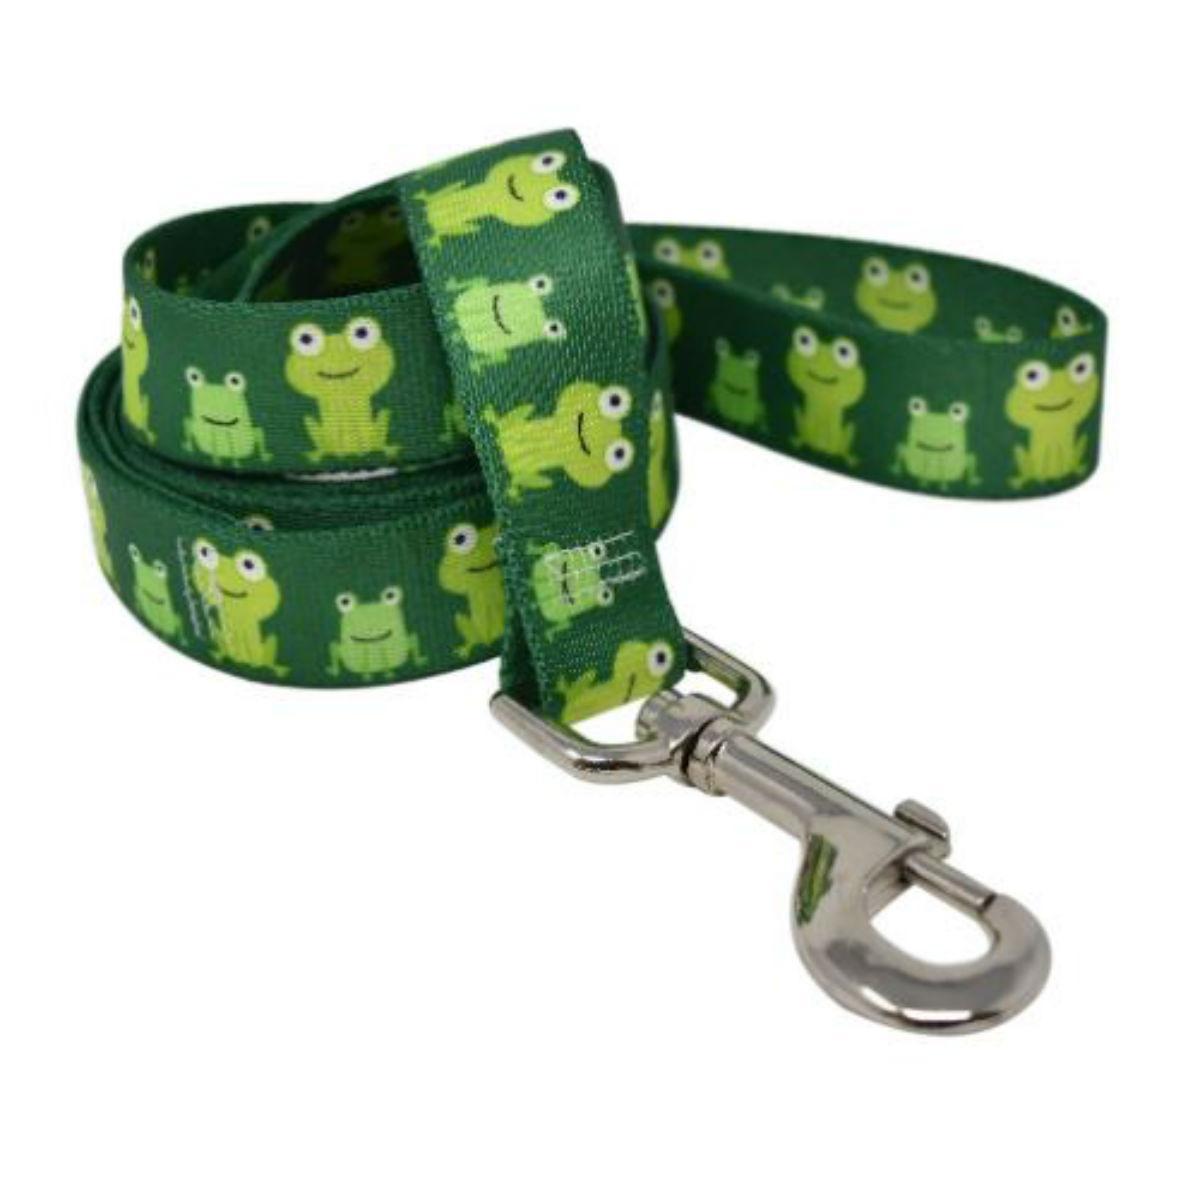 Frog Frenzy Dog Leash by Yellow Dog